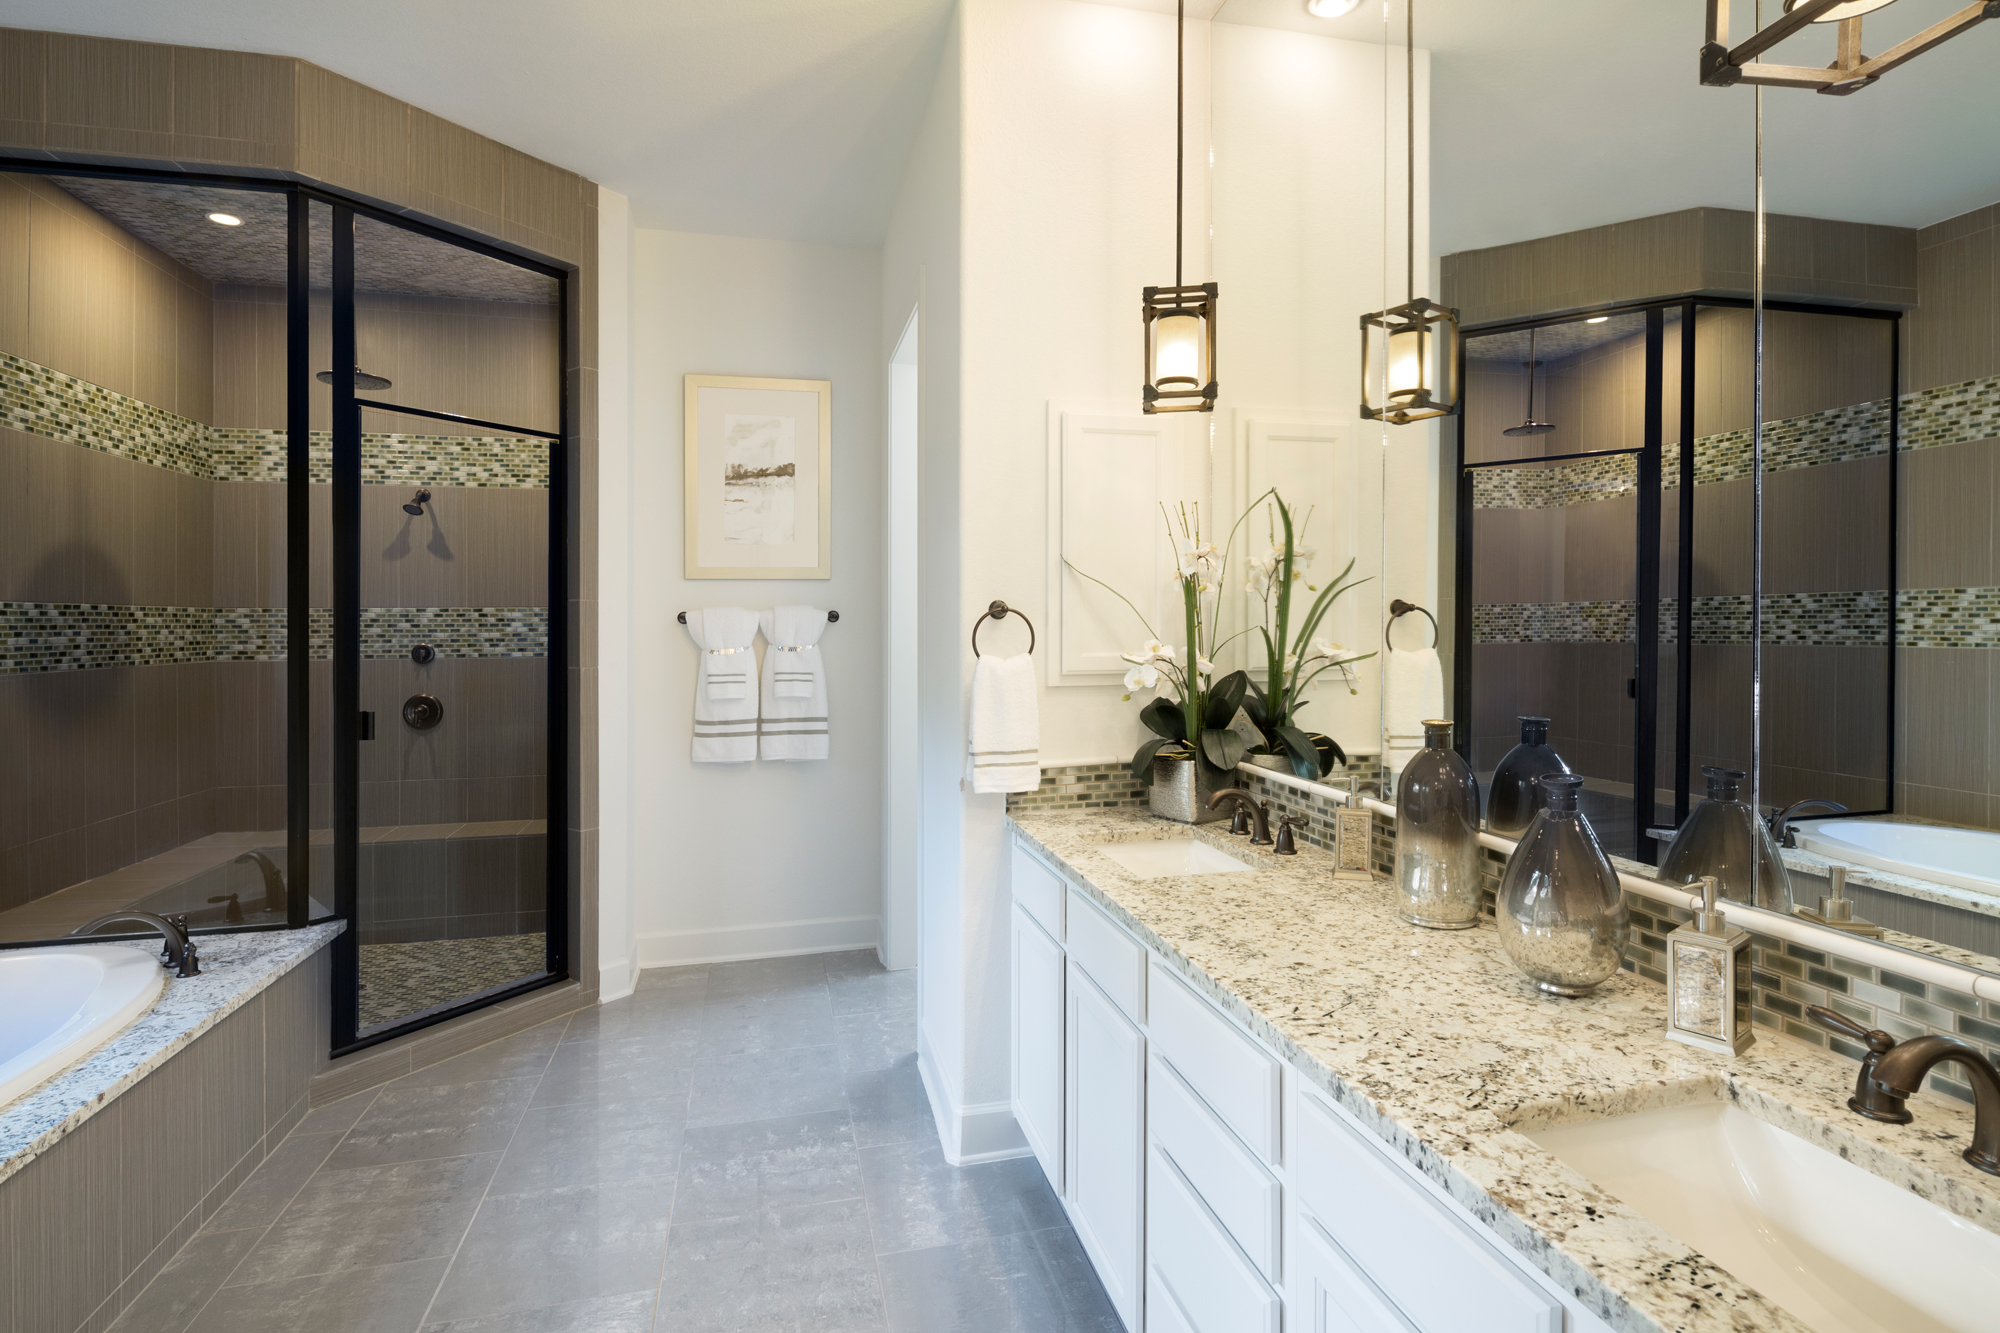 dfw-residential-interior-photographer.jpg